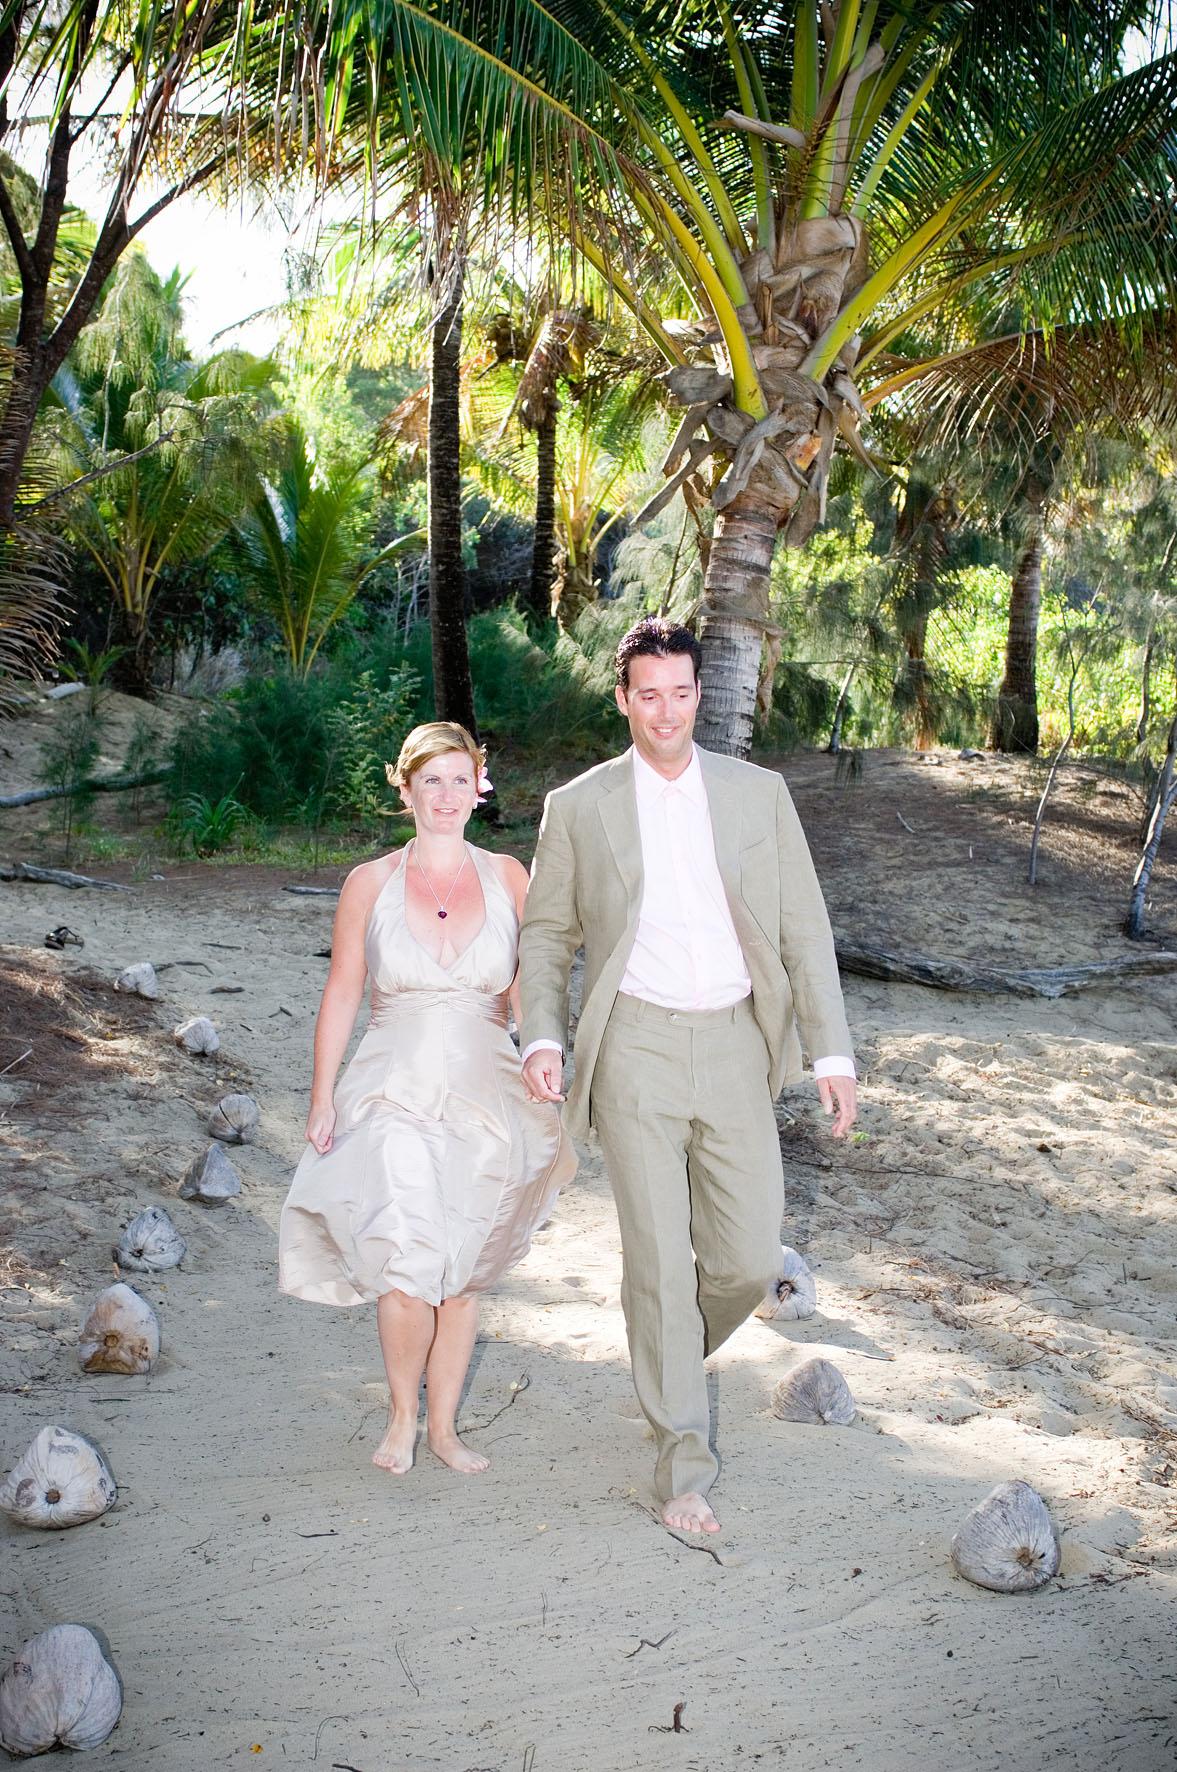 http://www.thalabeach.com.au/wp-content/uploads/2012/03/Wilma-Ralf.jpg